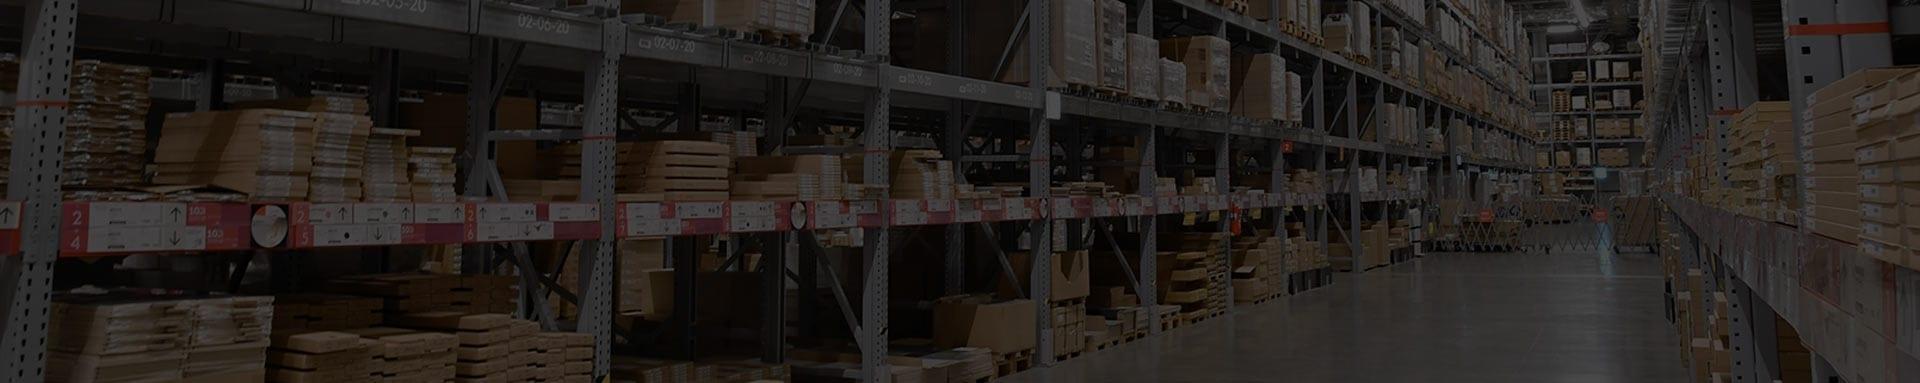 image of warehouse